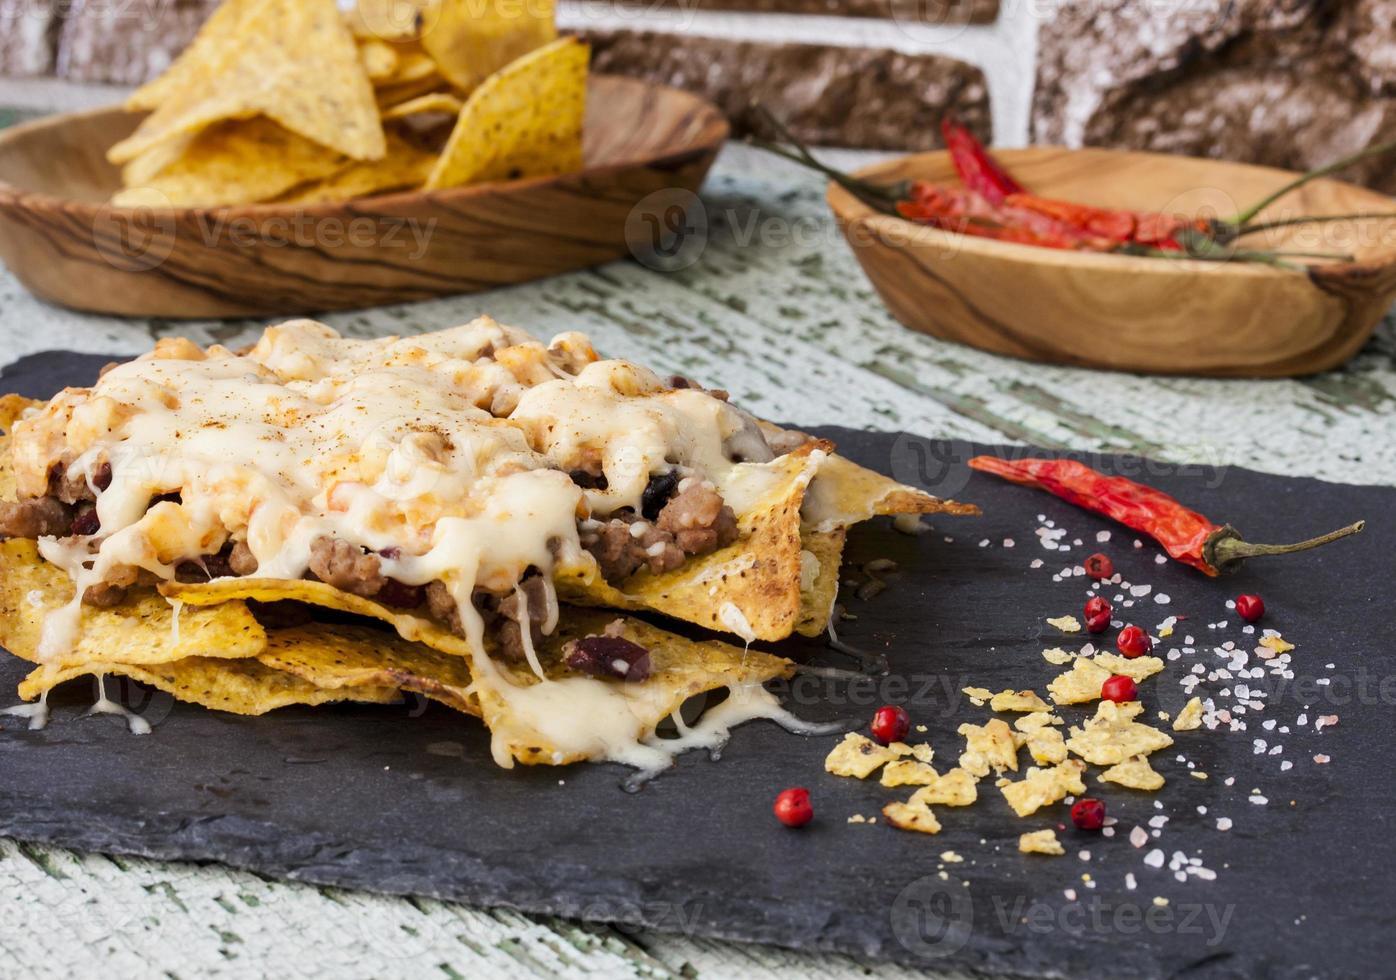 nachos au boeuf photo